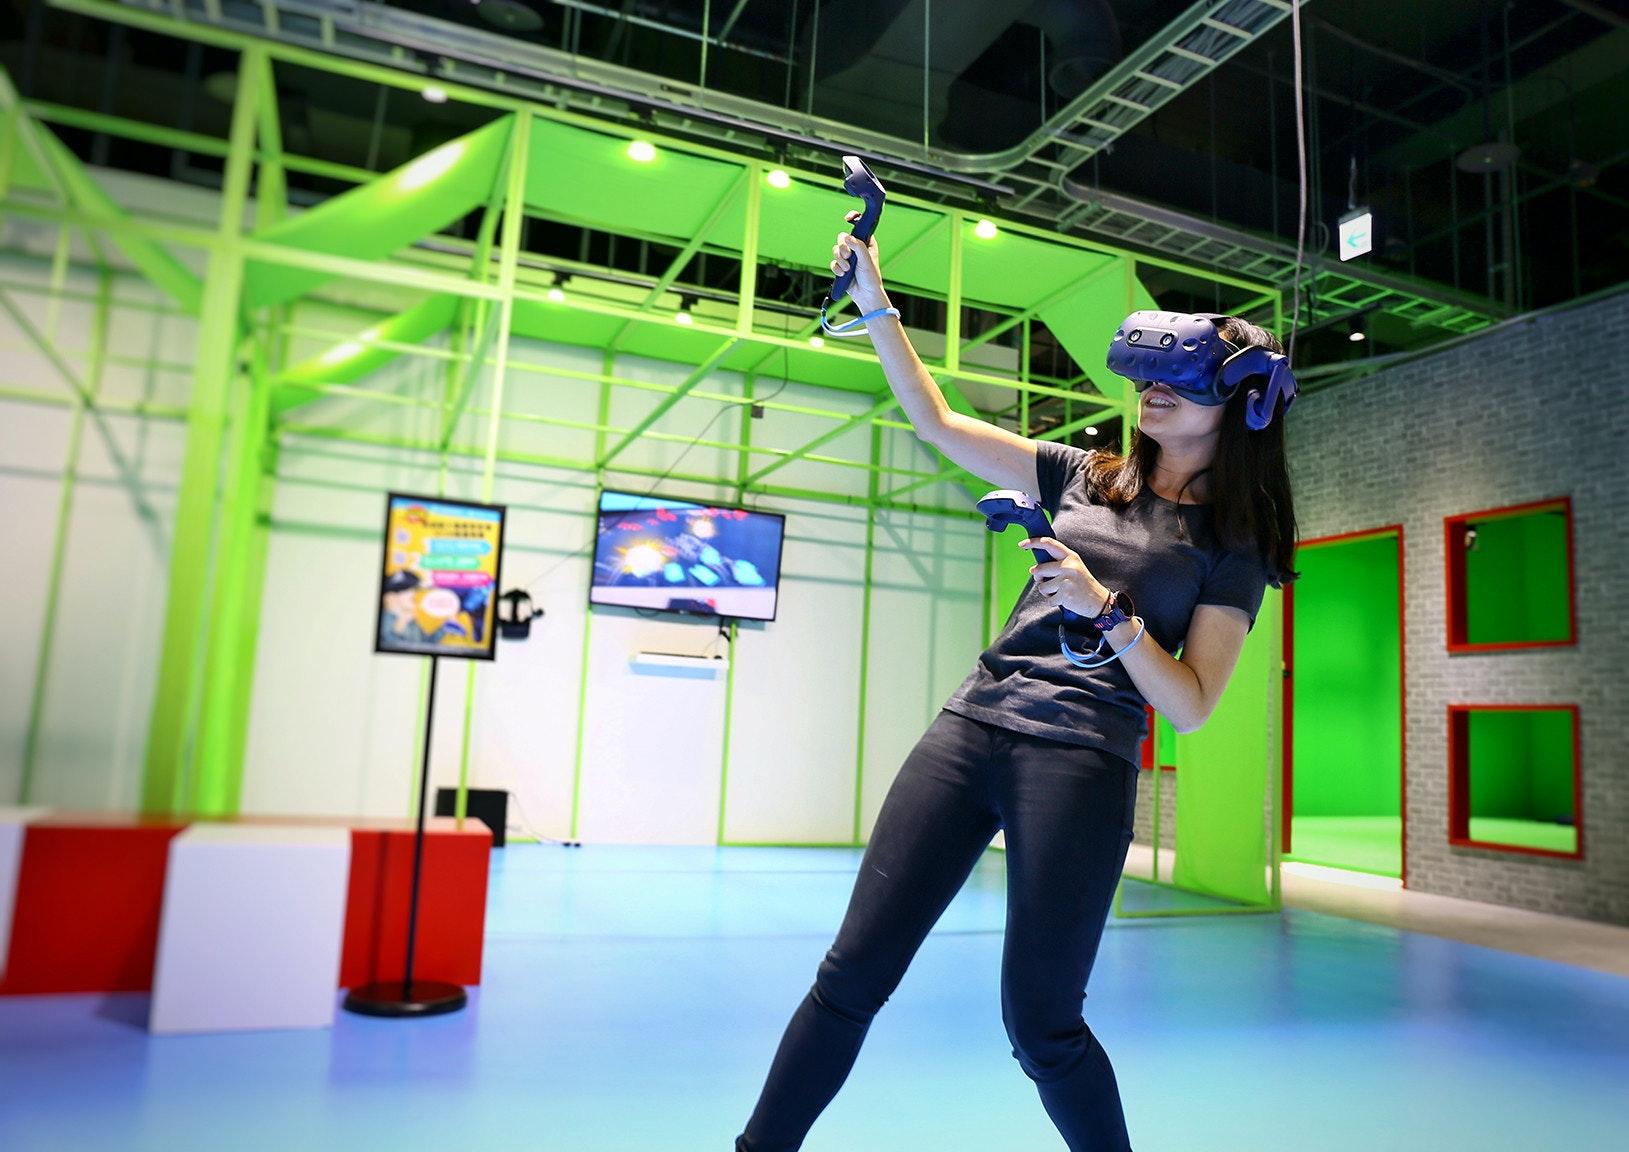 Game, Girl, Technology, , fun, blue, fun, technology, recreation, leisure, games, girl